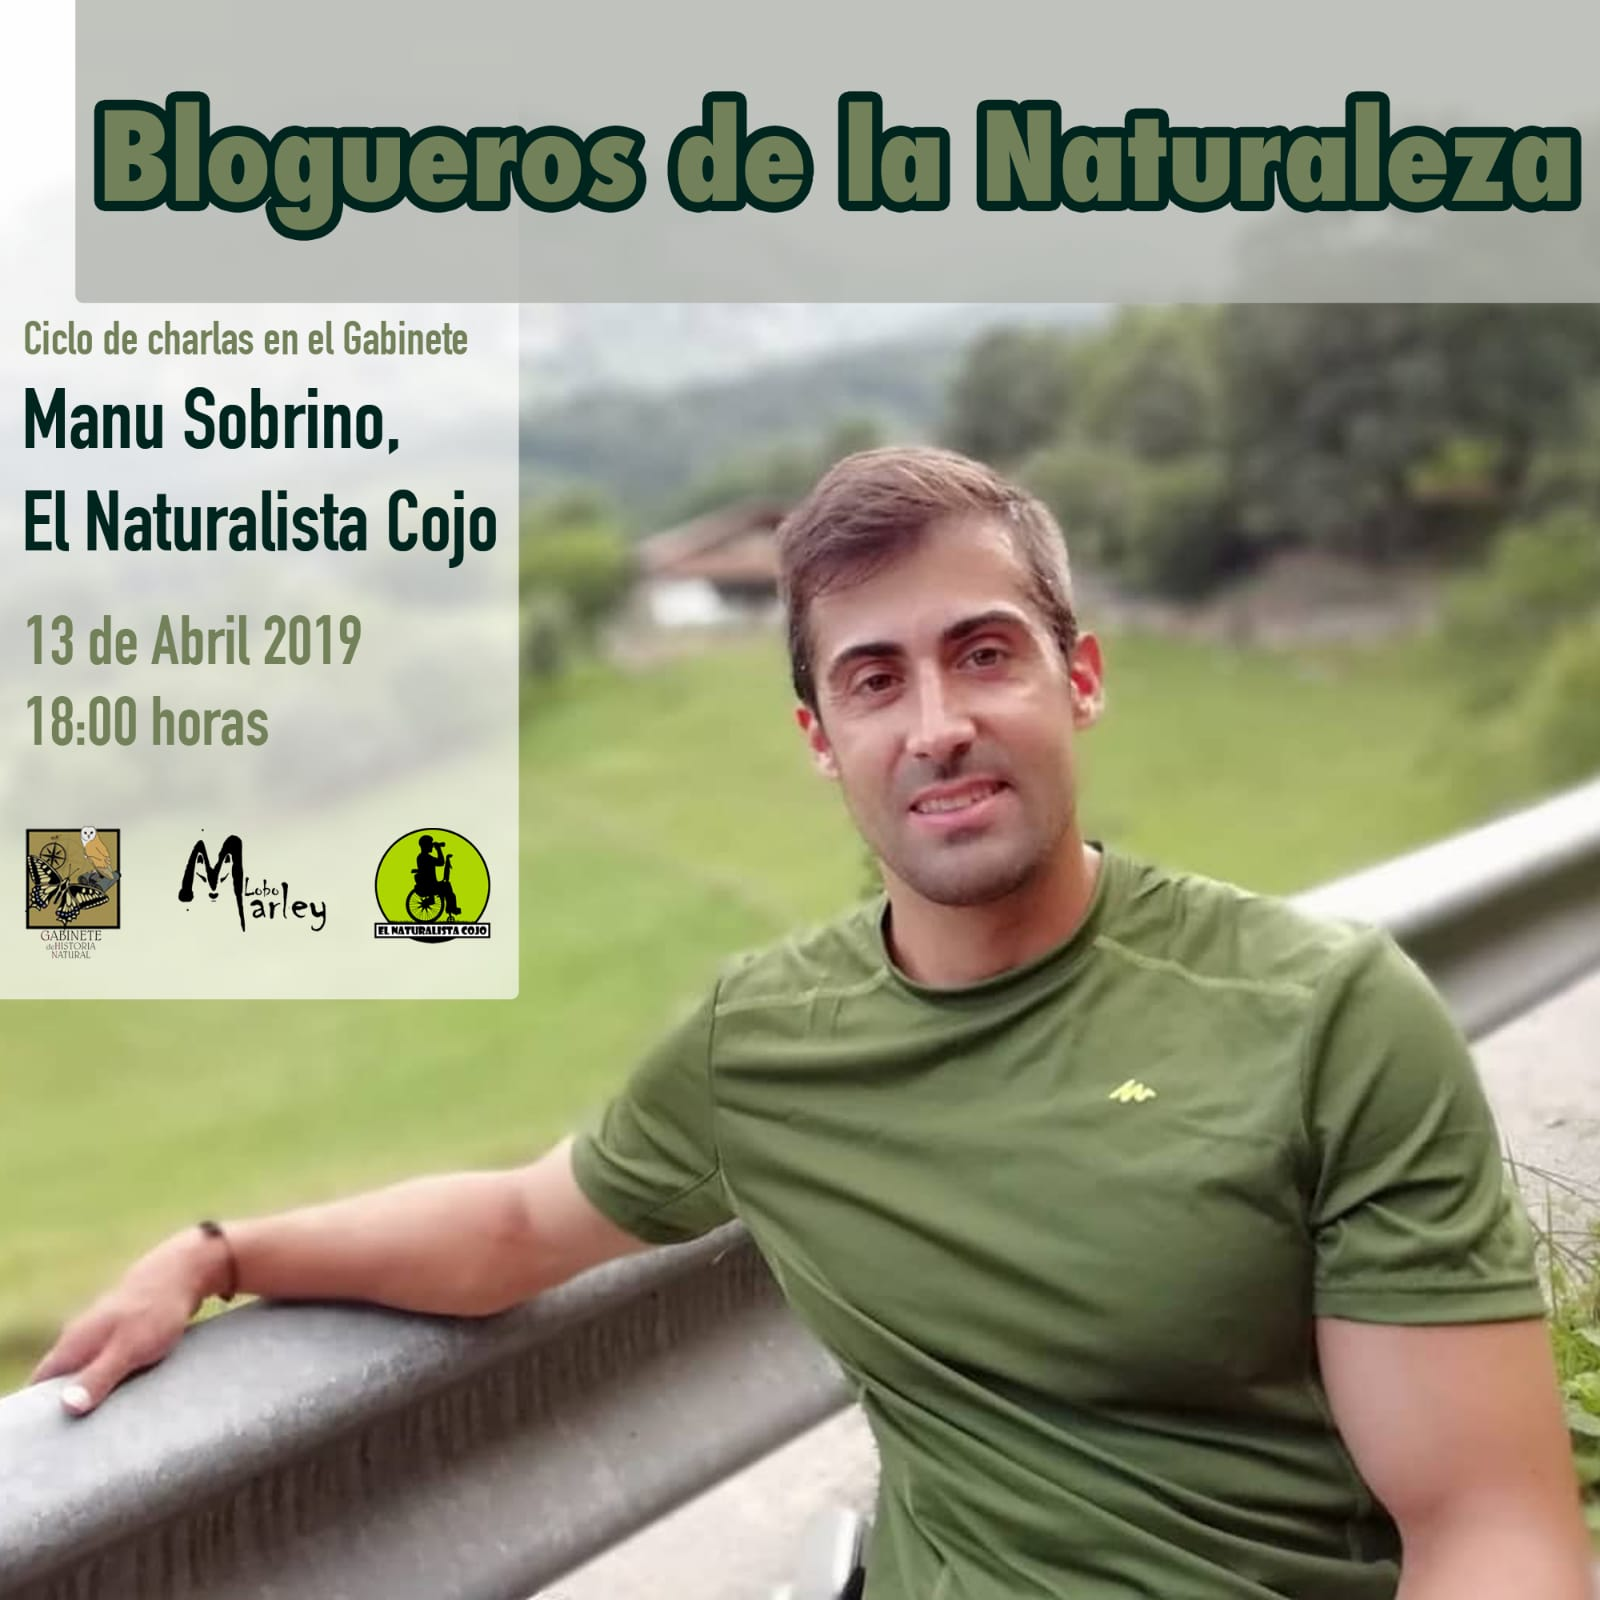 Manu Sobrino, el naturalista cojo